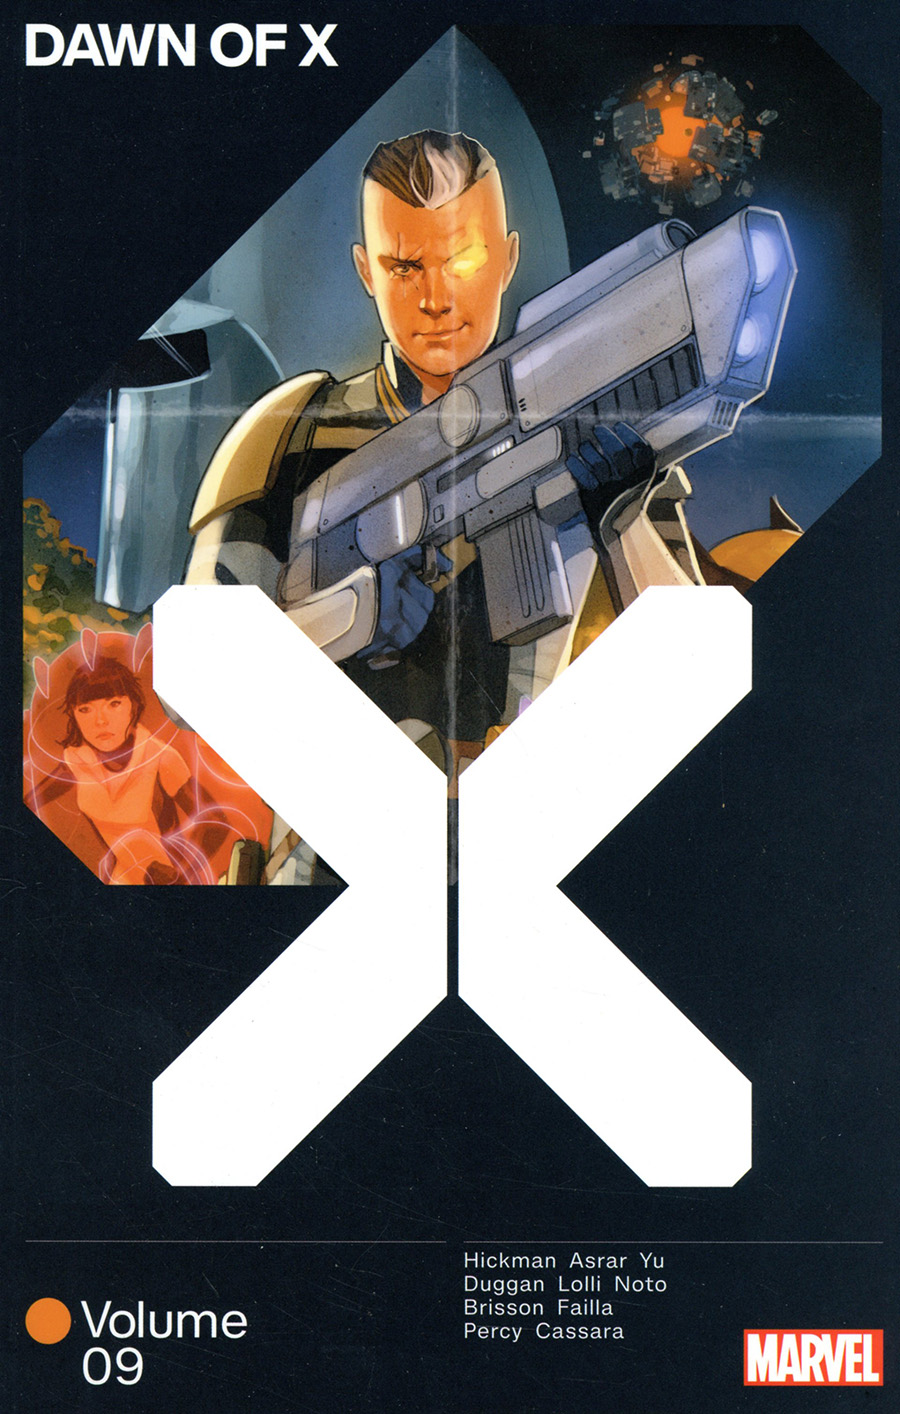 Dawn Of X Vol 9 TP